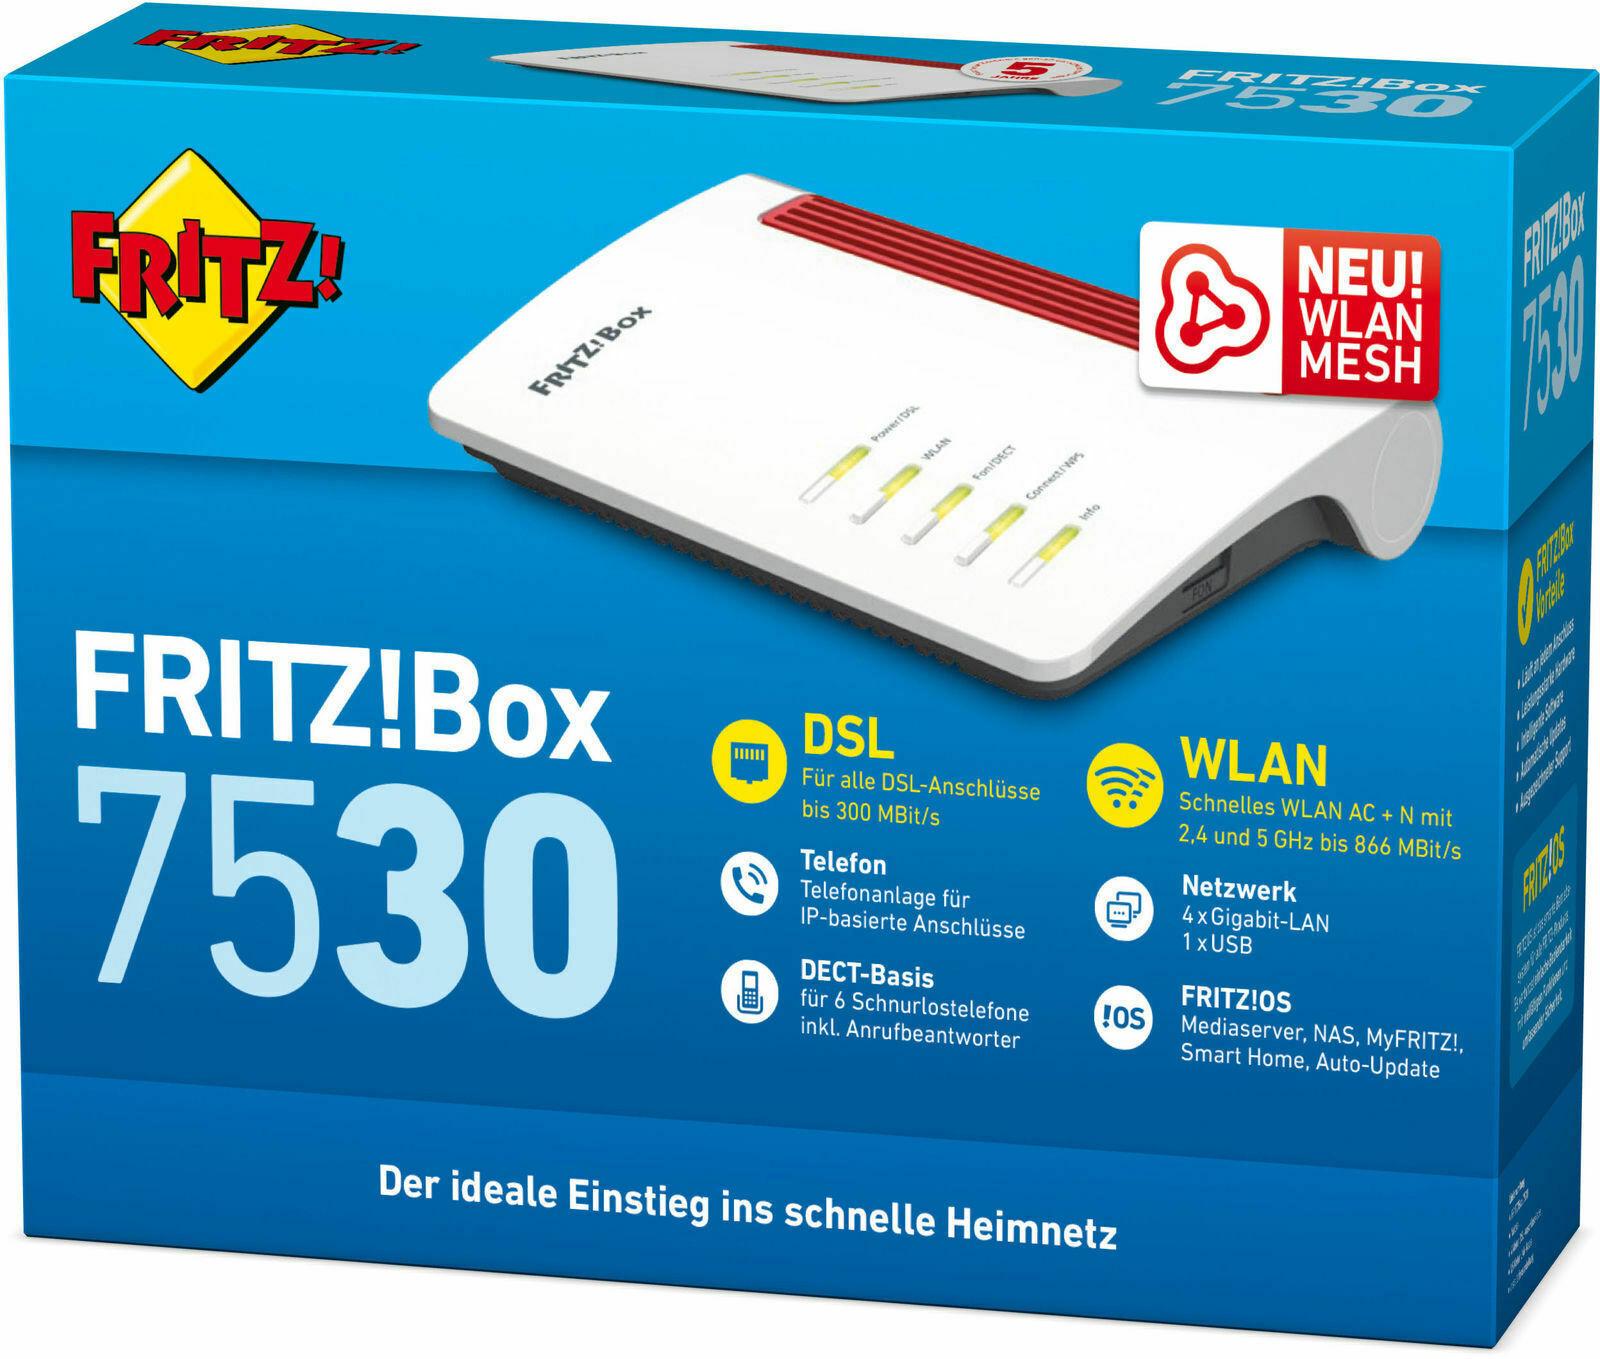 AVM FRITZBox 20 Dual Band WLAN Router mit Integriertes VDSL ...